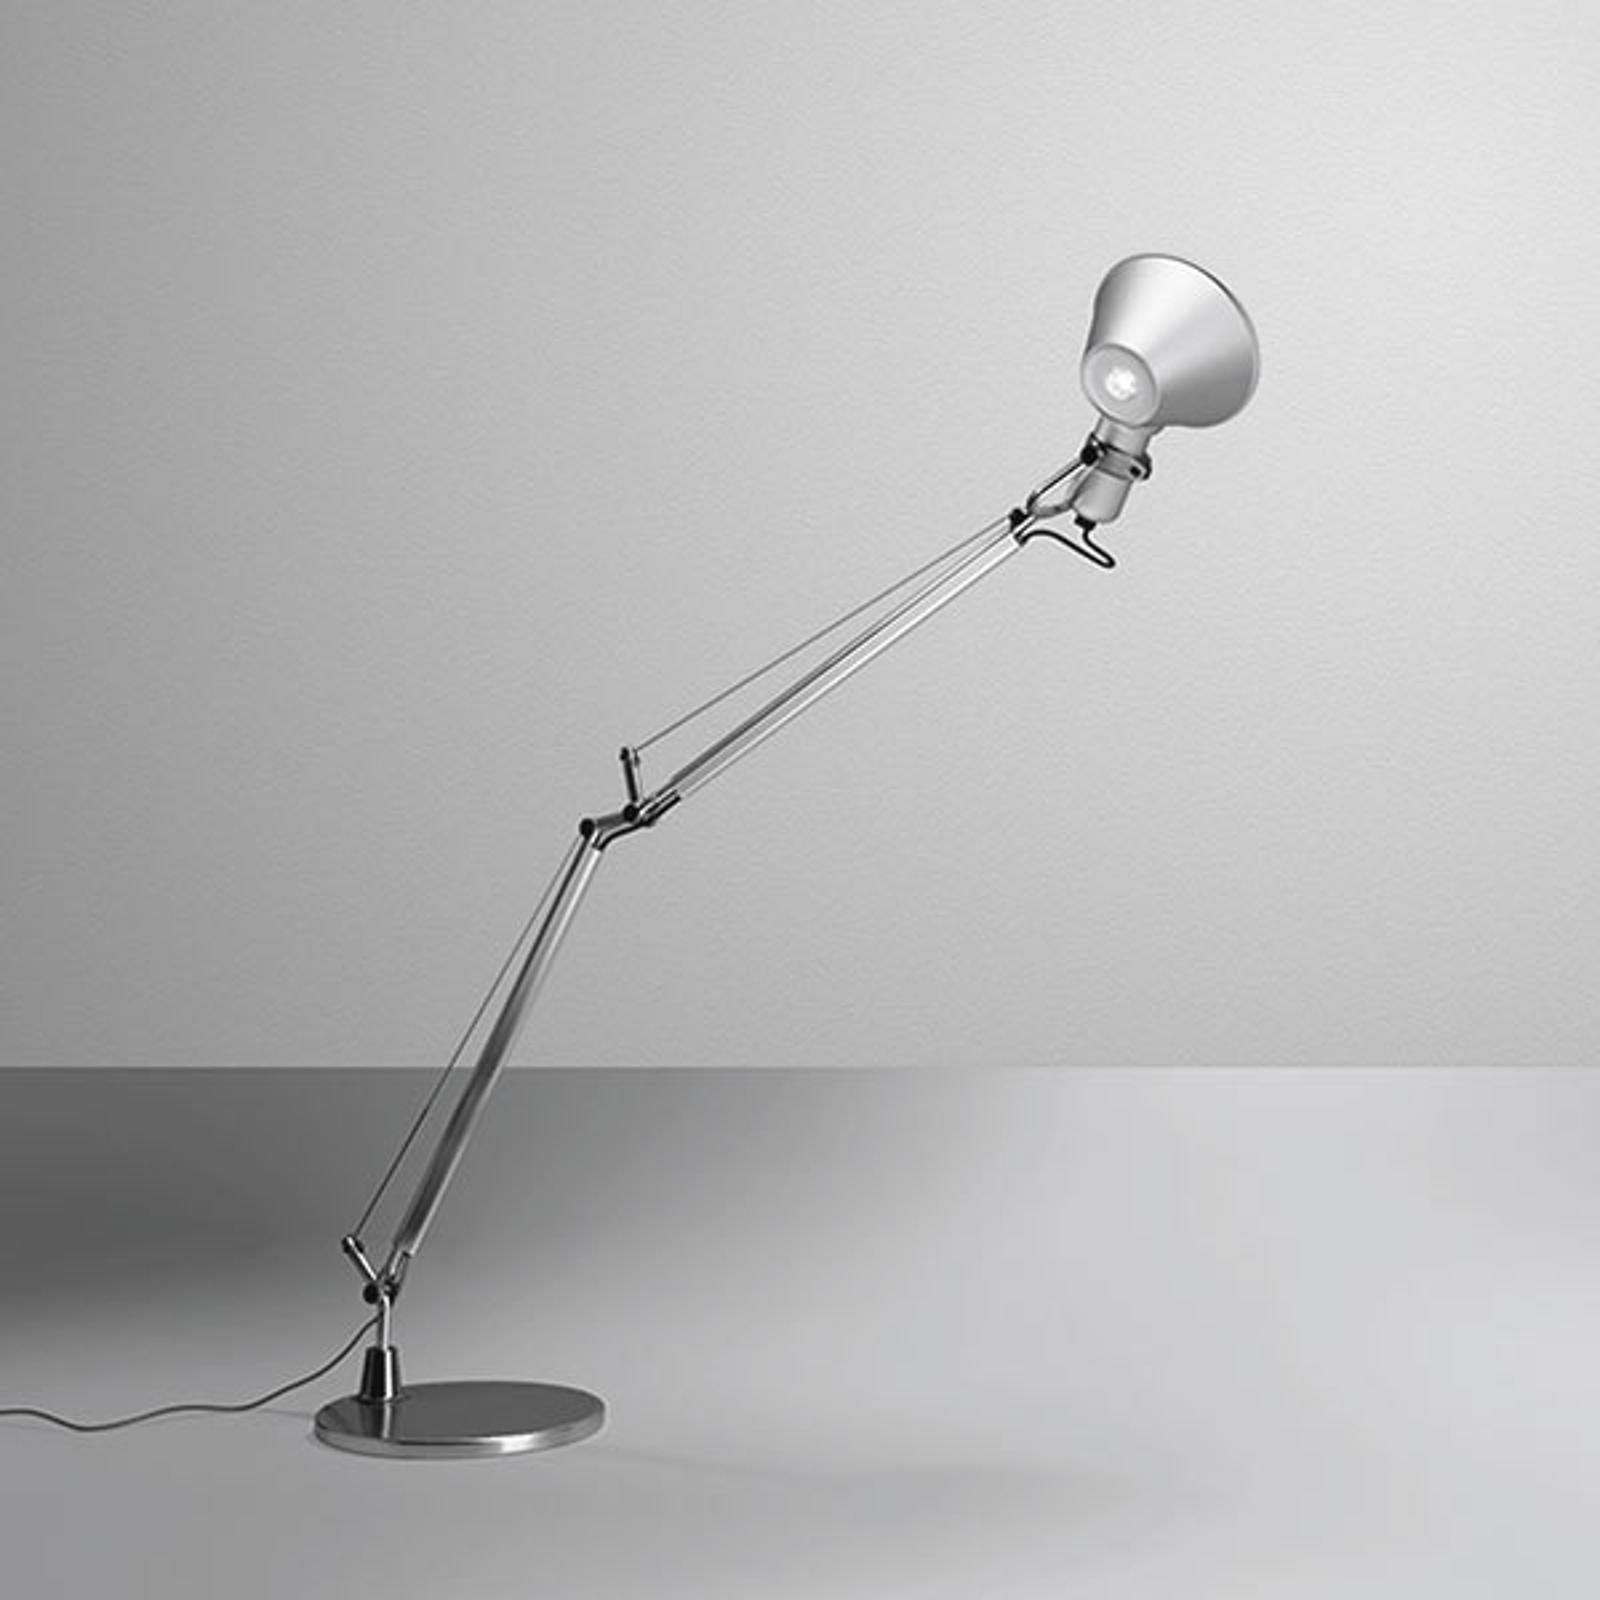 Artemide Tolomeo Midi LED-Tischleuchte, alu, 2700K